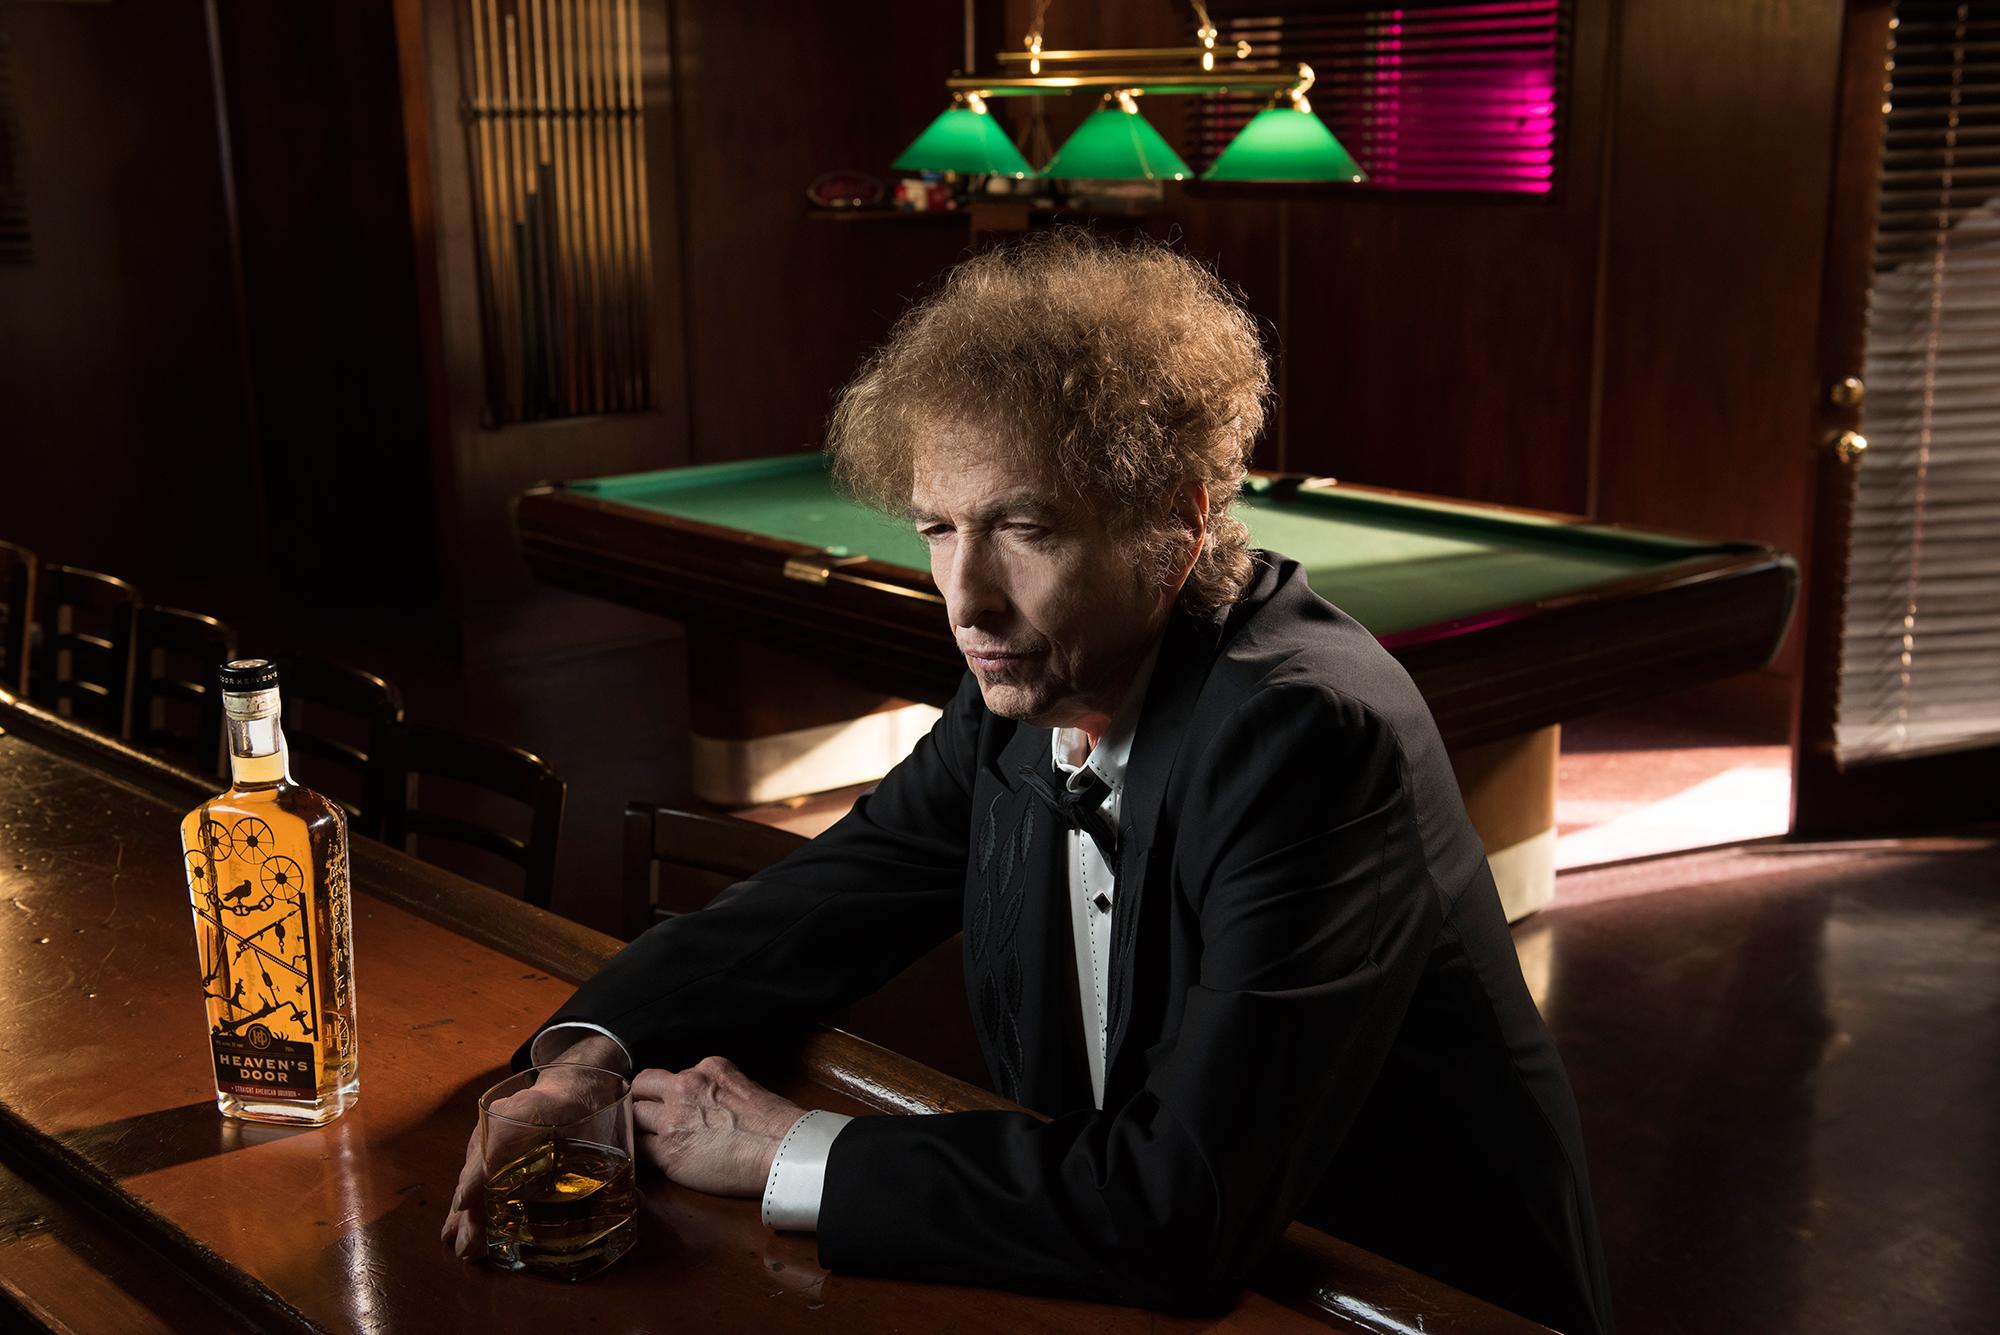 Best Rye Whiskey 2020 Bob Dylan to Open Whiskey Distillery in Nashville in 2020